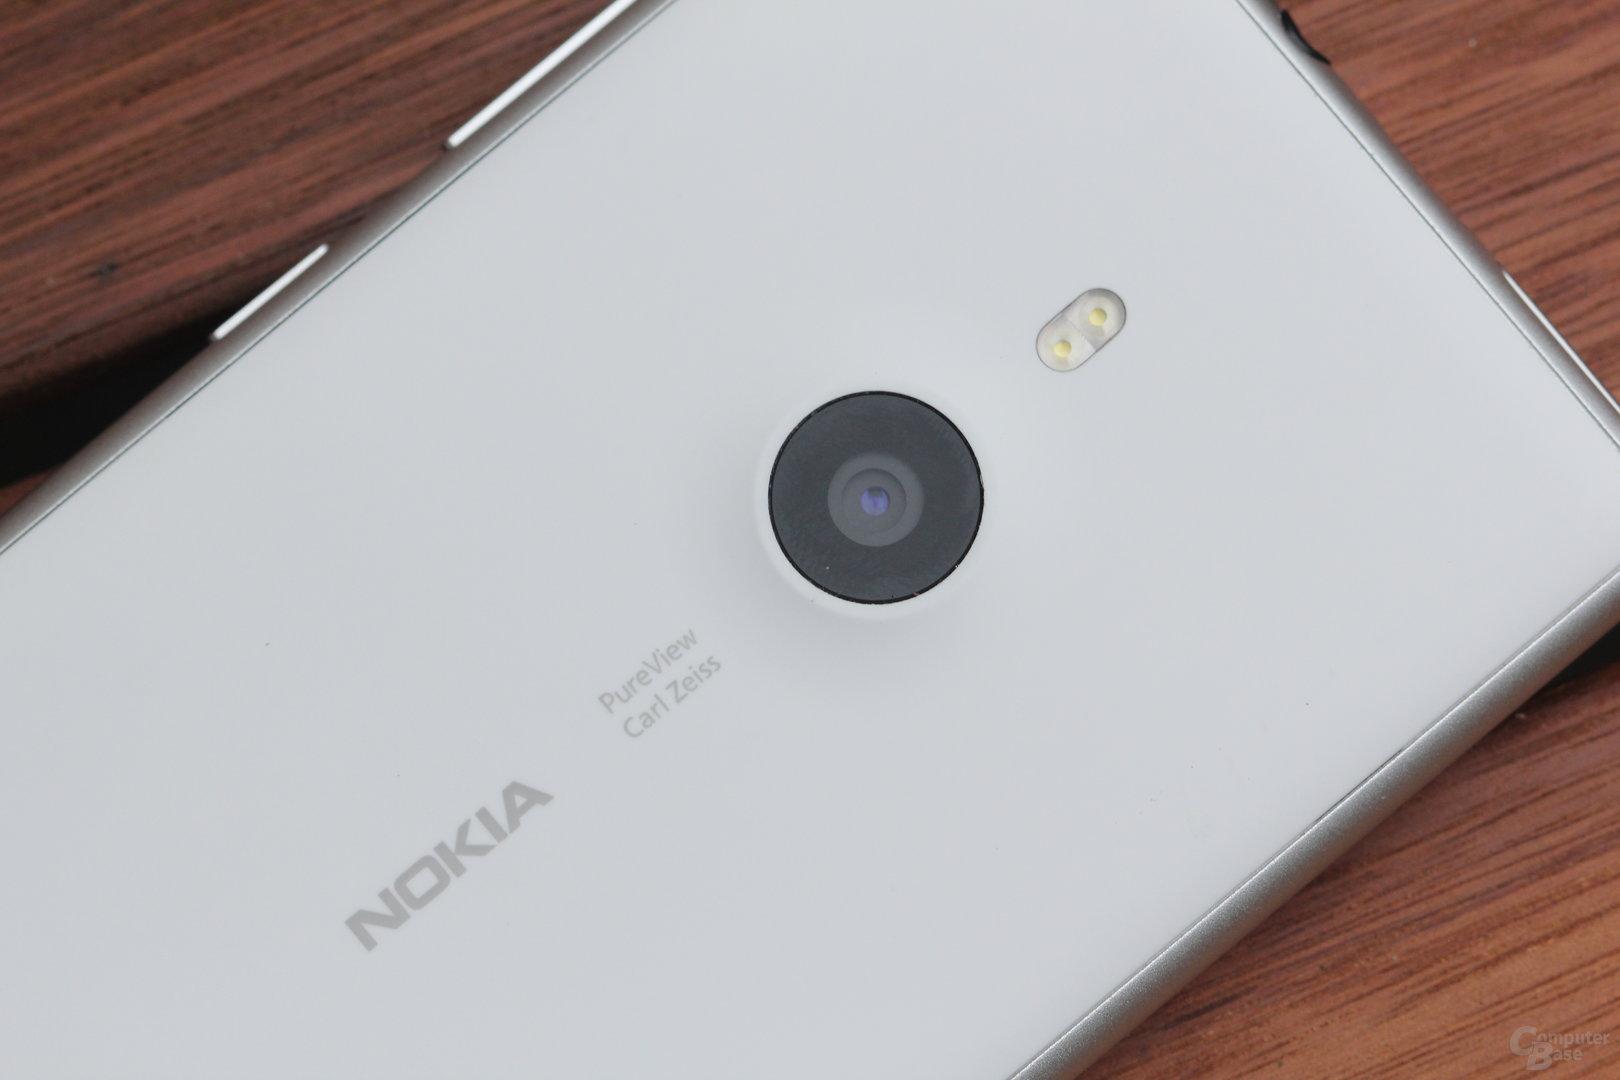 Nokia Lumia 925 - Kamera und Blitz